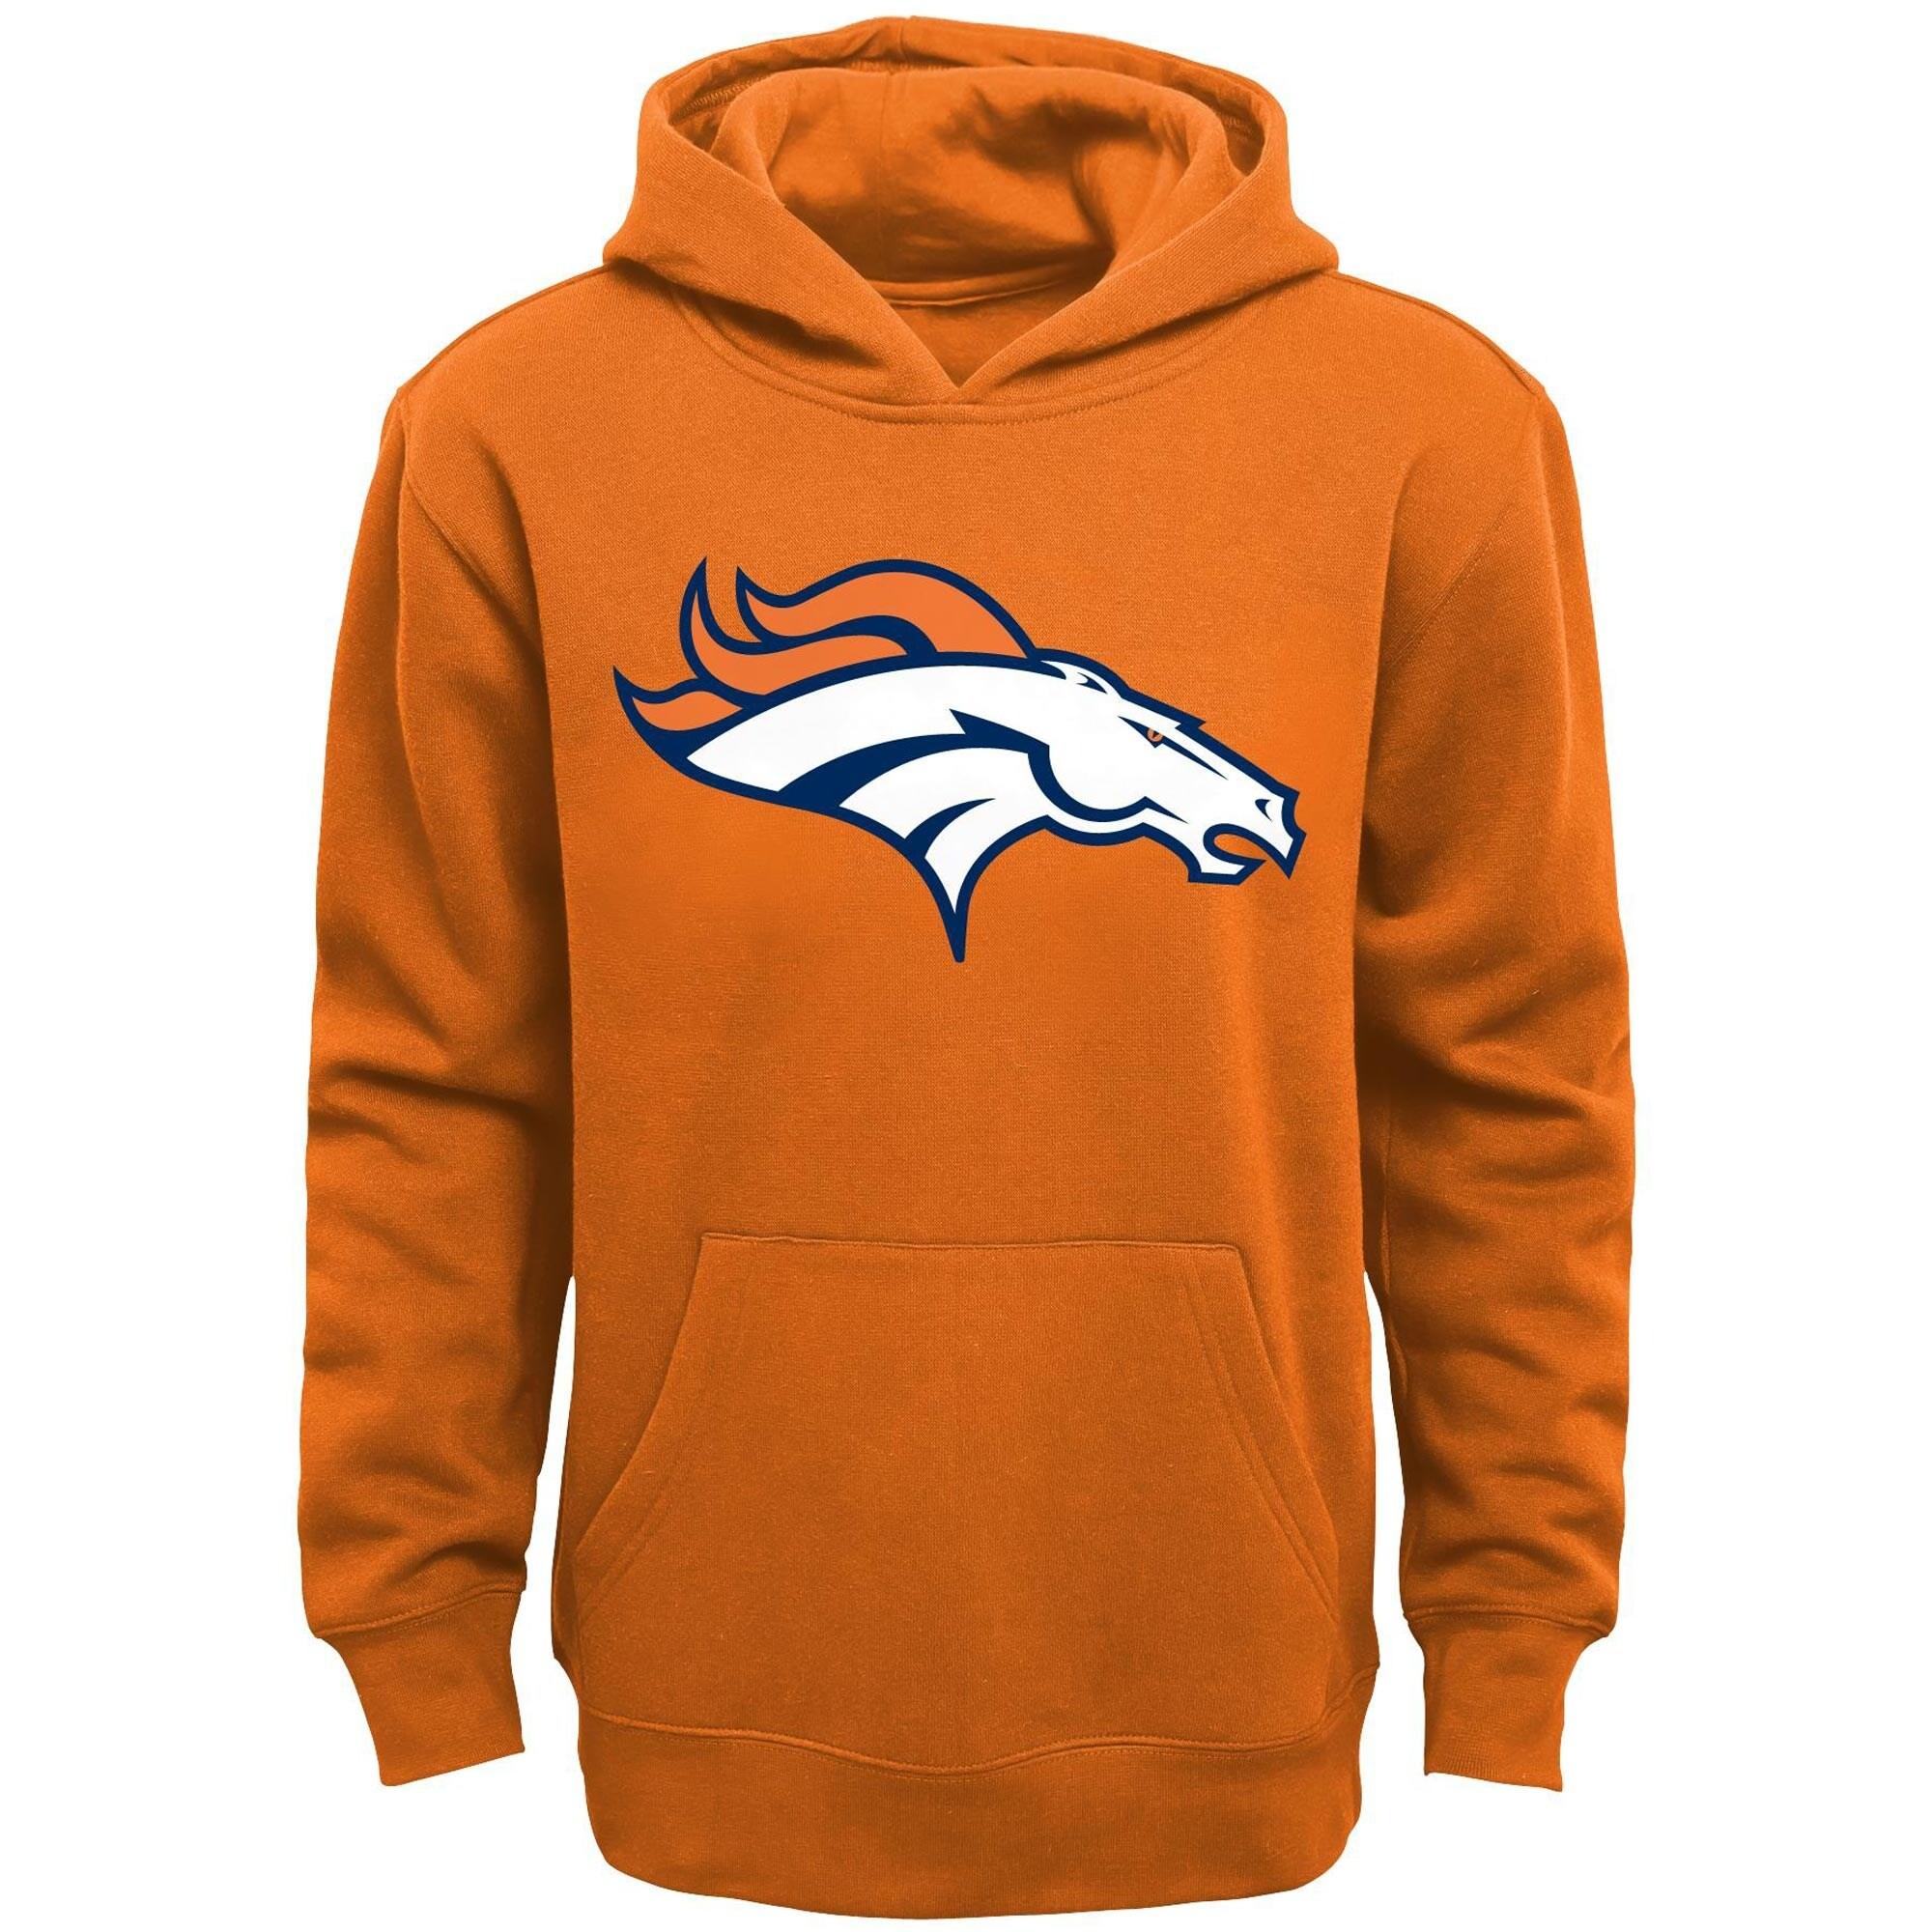 Denver Broncos Youth Primary Logo Team Color Fleece Pullover Hoodie - Orange